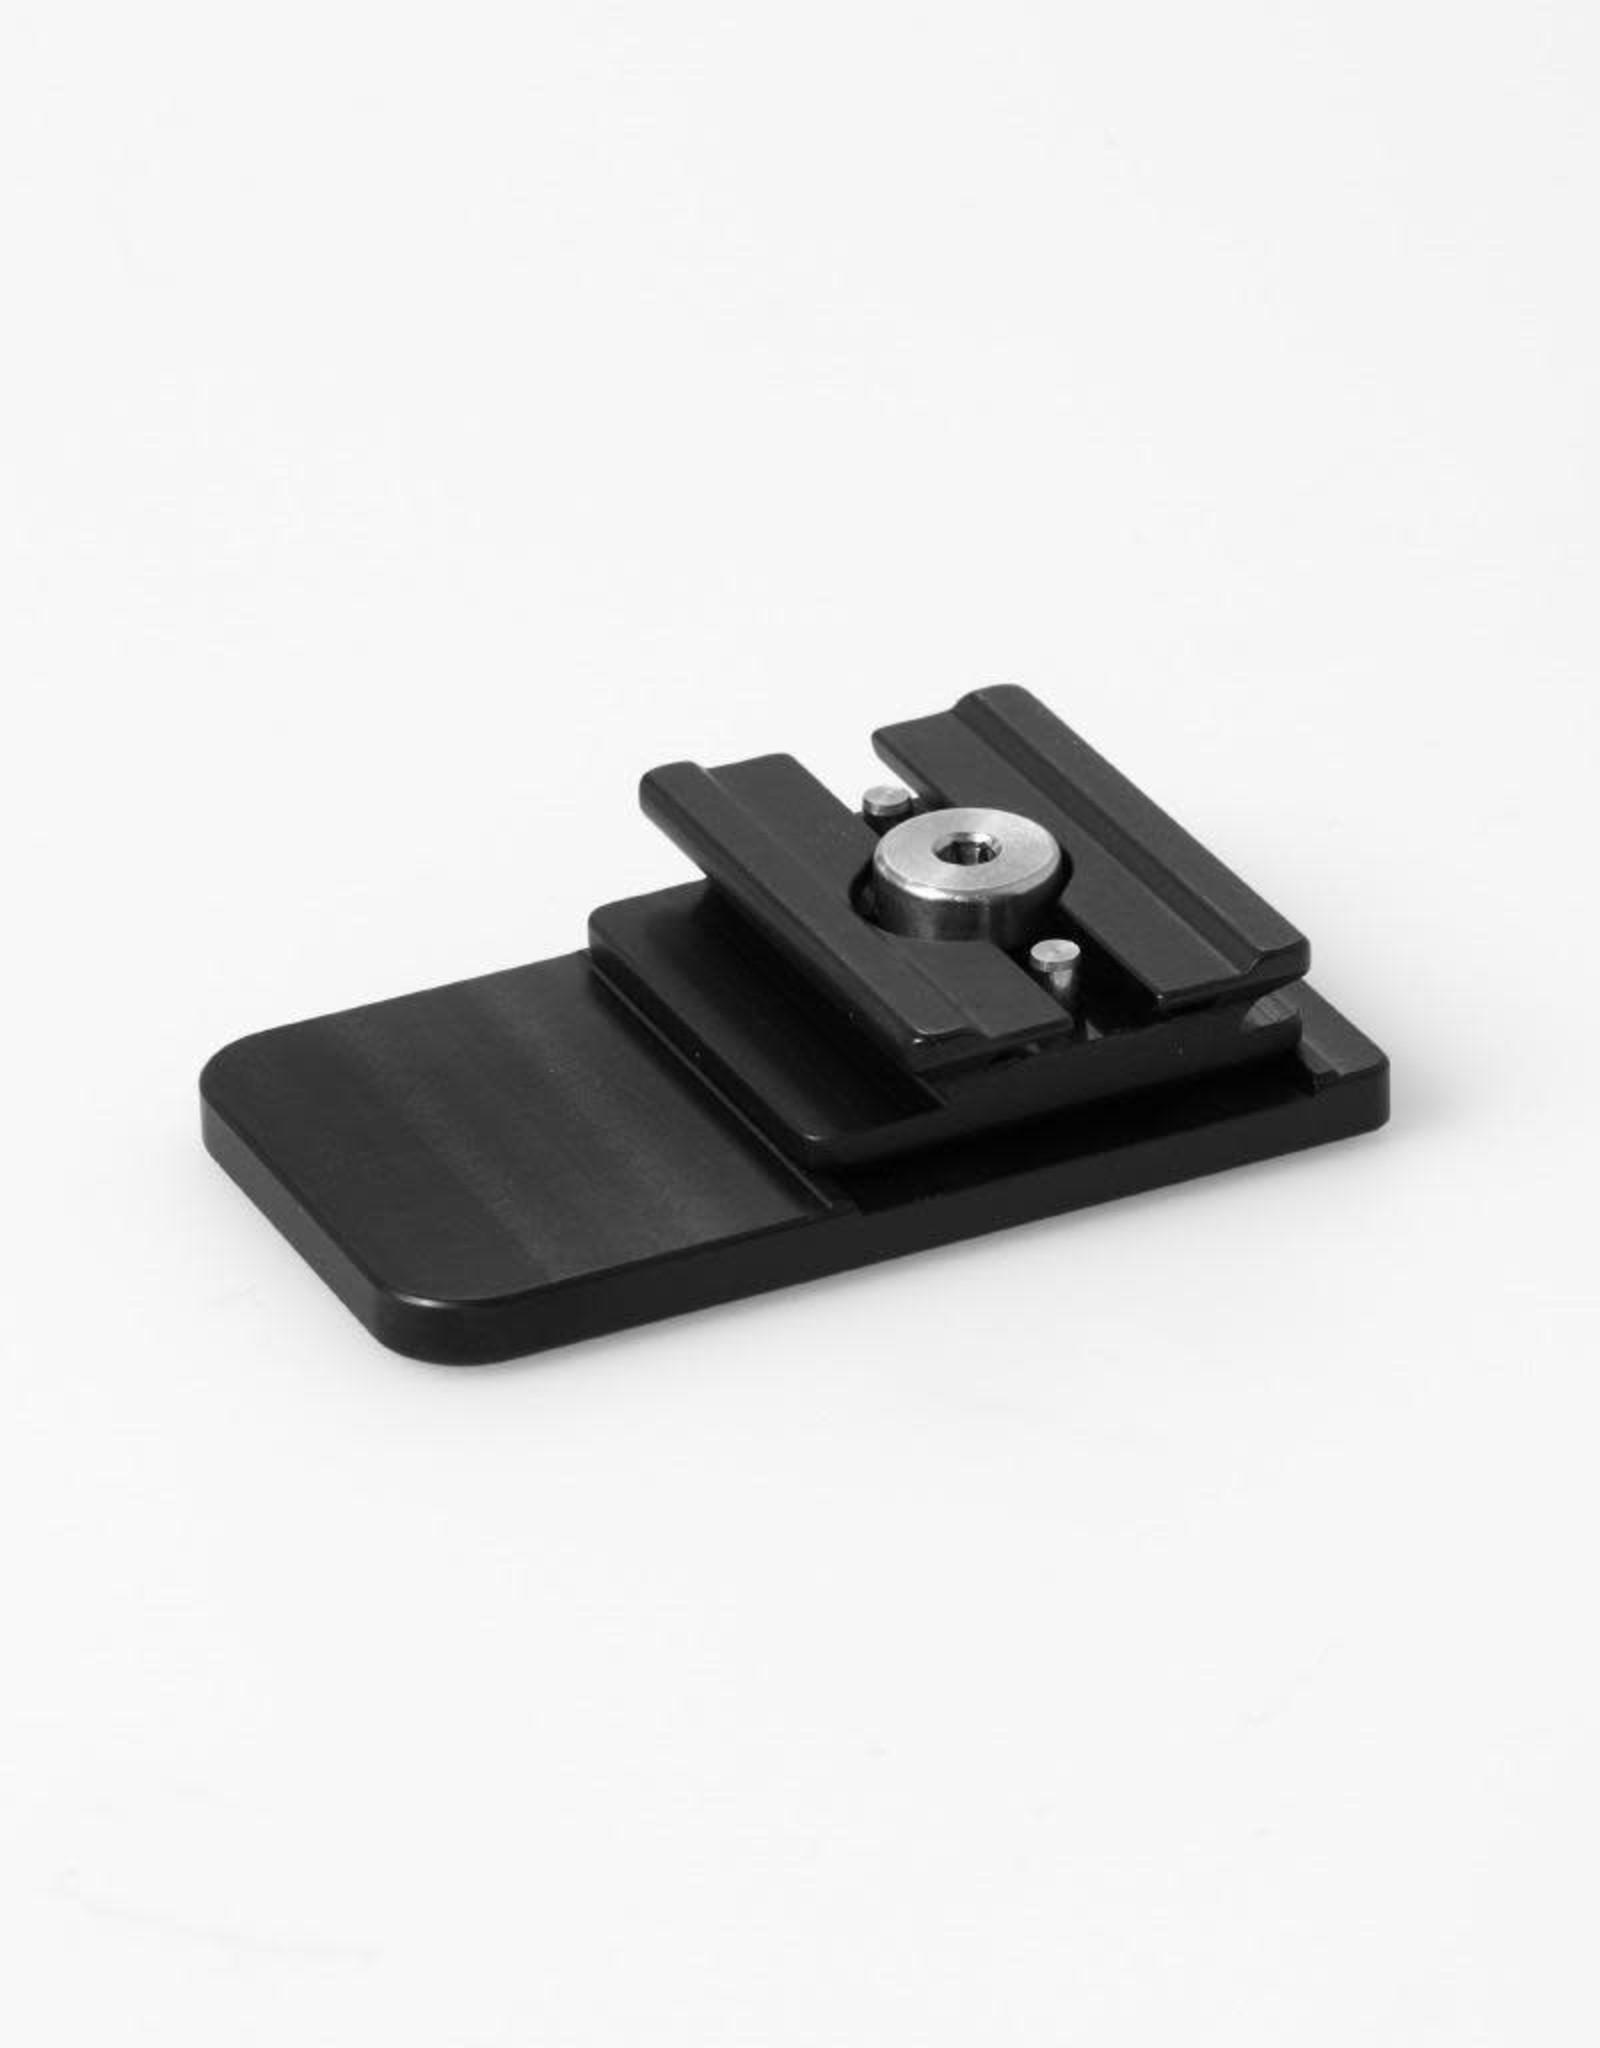 Arca Swiss Arca Swiss Camera plate monoball®Fix SLRindex Variokit